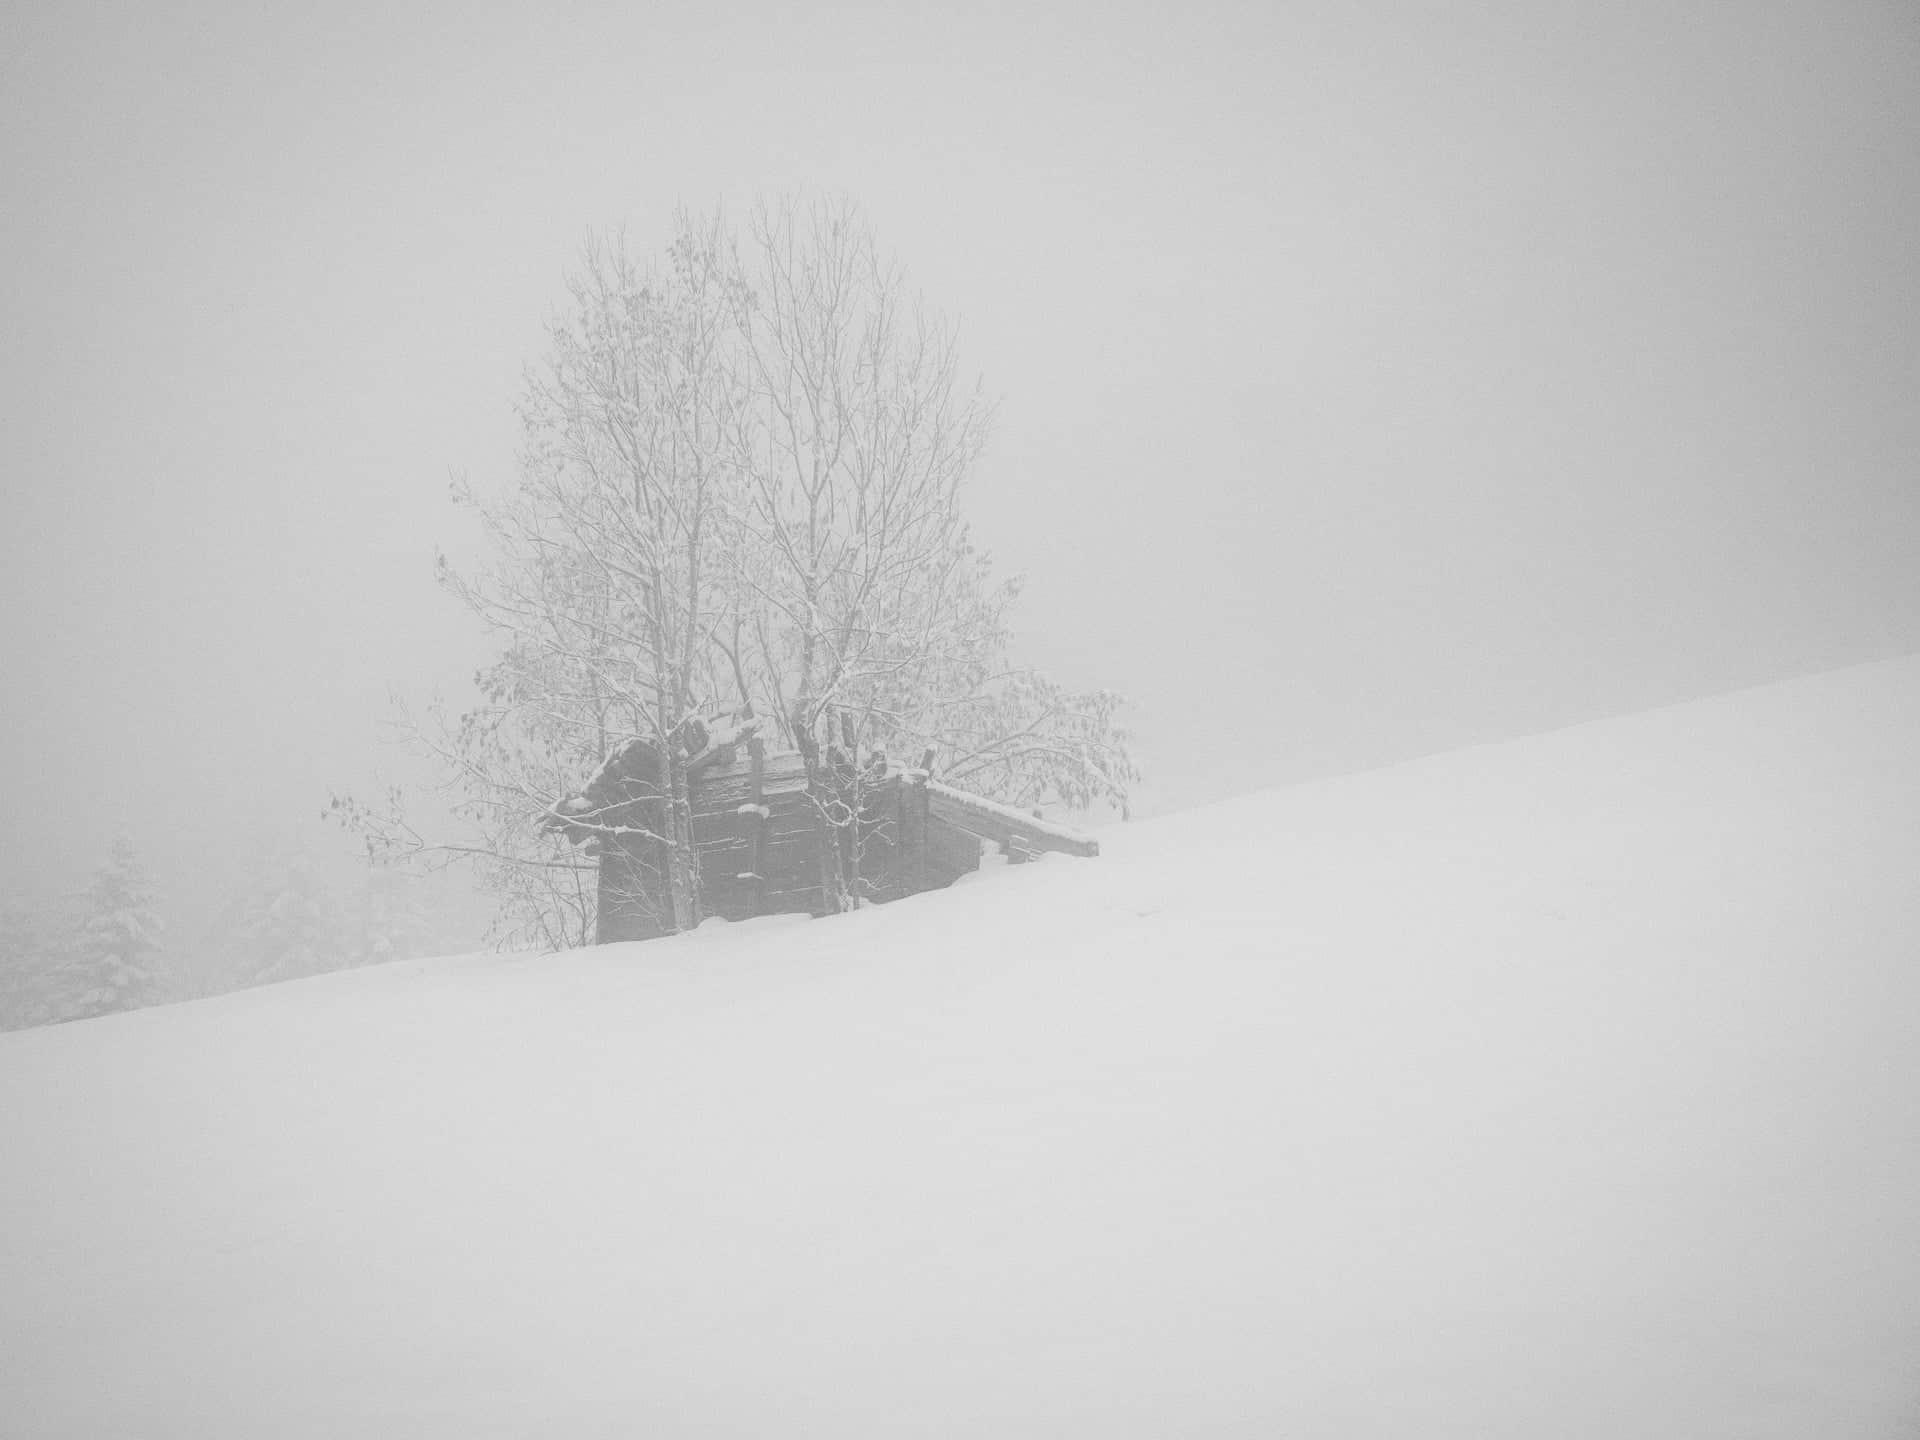 Grand-Bornand noir&blanc - 2